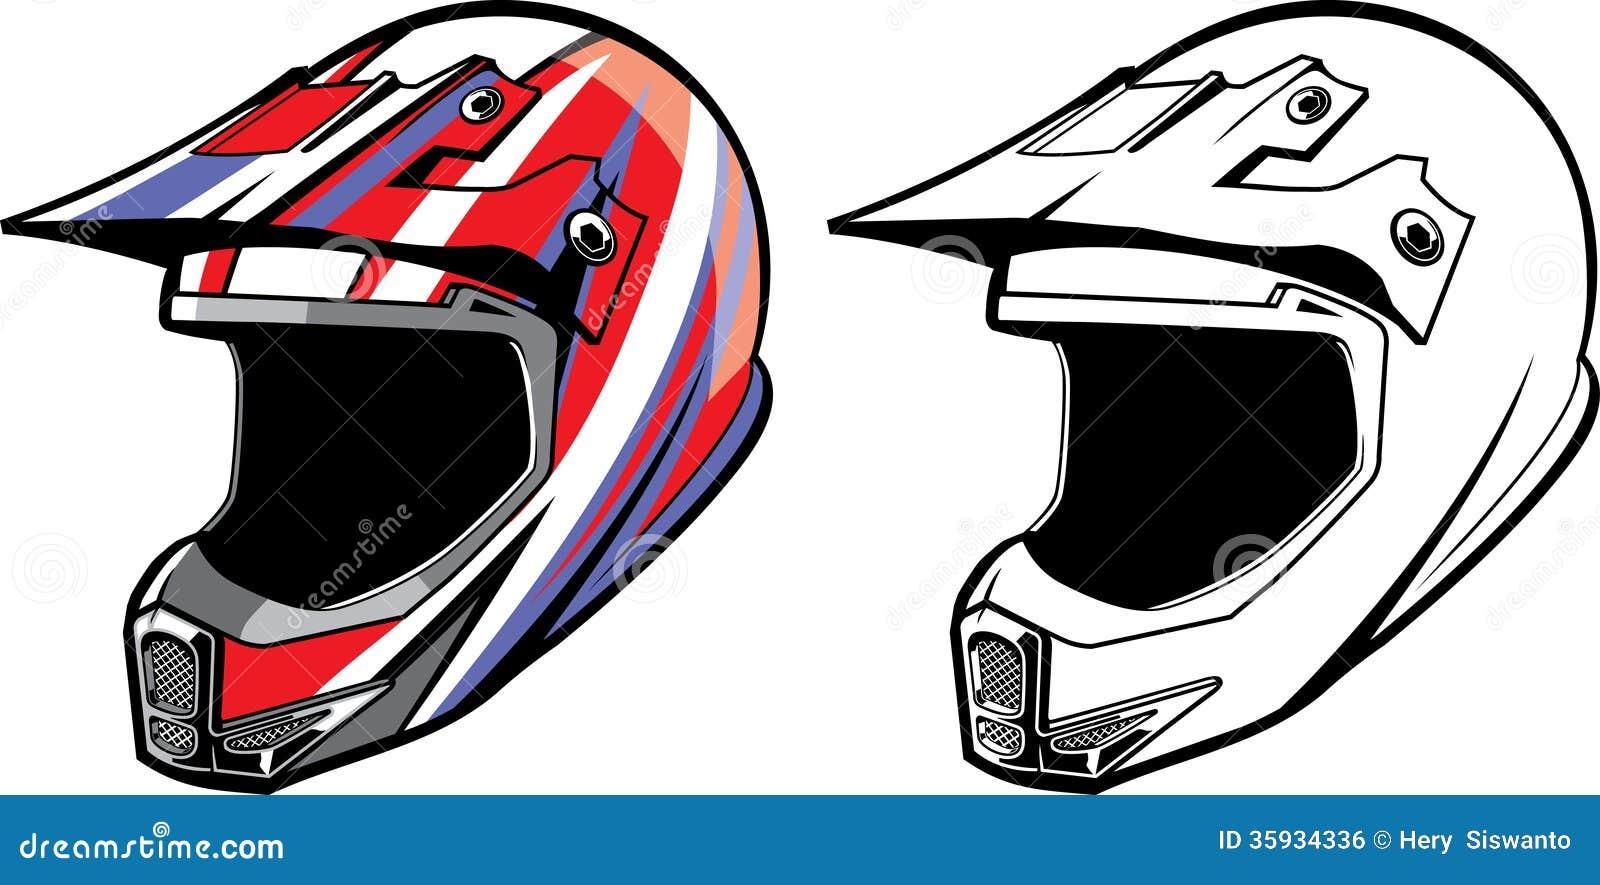 Motocross Helmet Royalty Free Stock Image - Image: 35934336